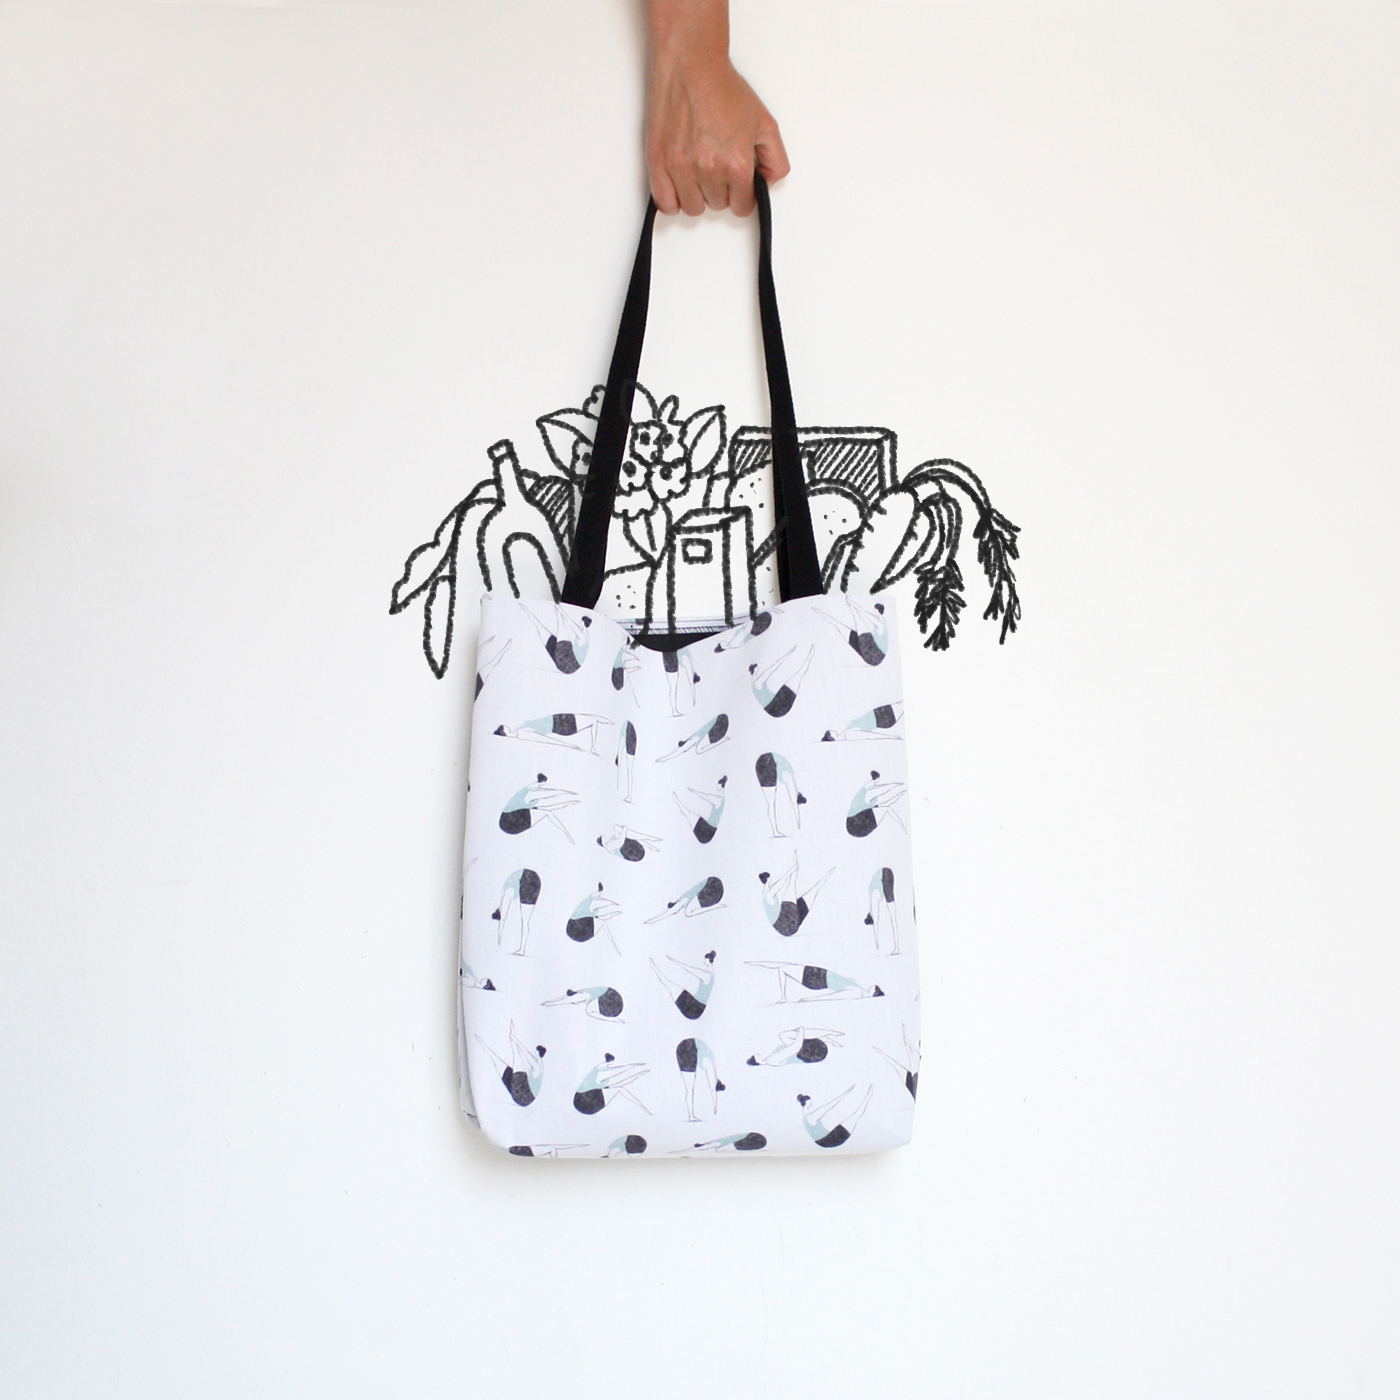 illustrated Pilates tote bag by Annemarie Gorissen.